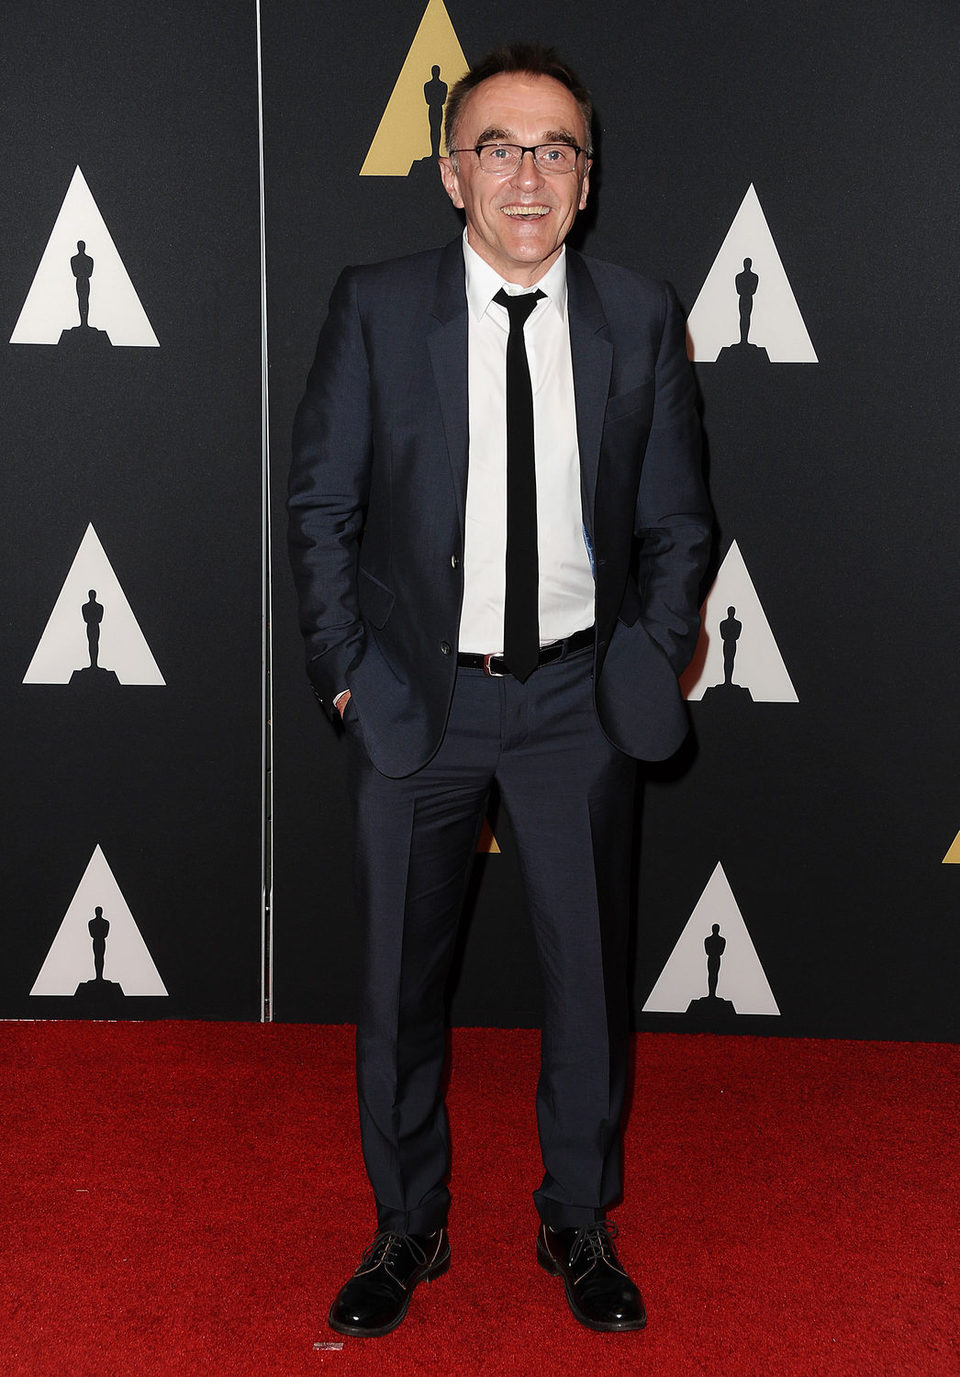 Danny Boyle in Governor's Awards 2015